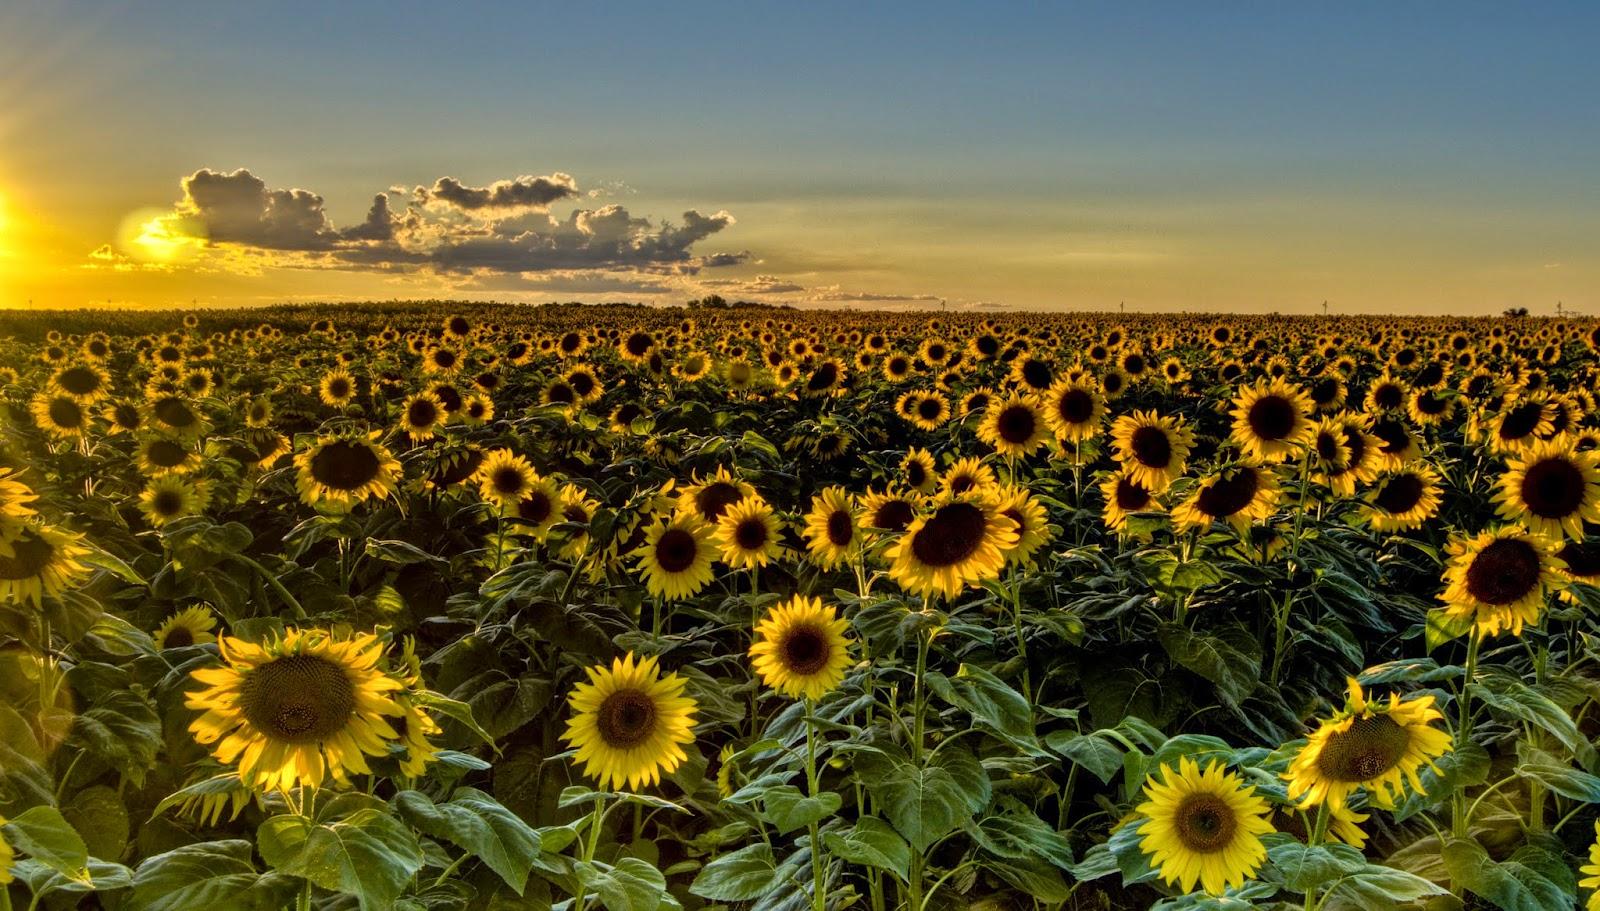 Voc se importa com as flores paisagens deslumbrantes for Pagina de wallpapers hd